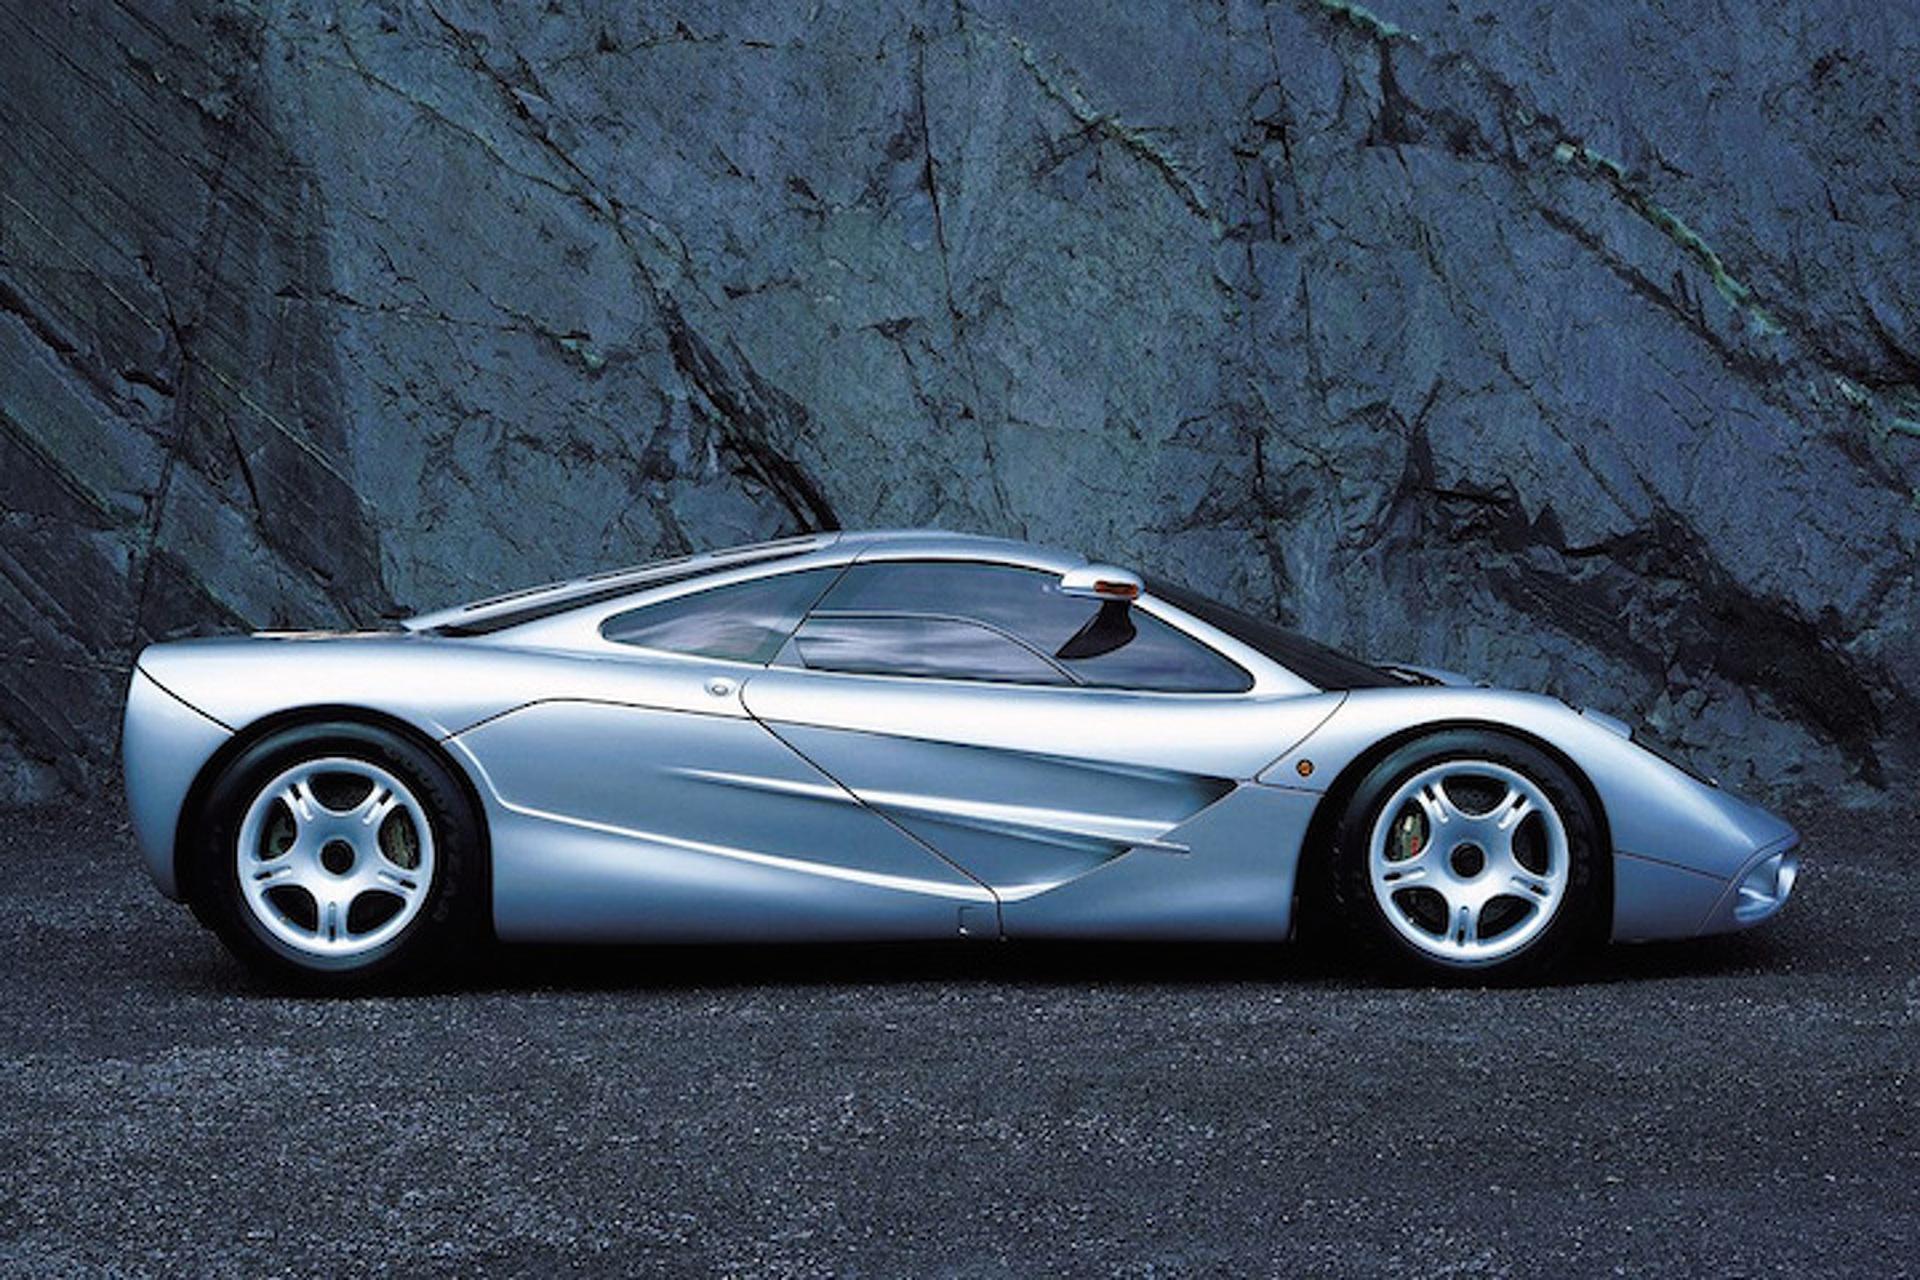 Buyer Beware: 1994 McLaren F1 For Sale On Craigslist